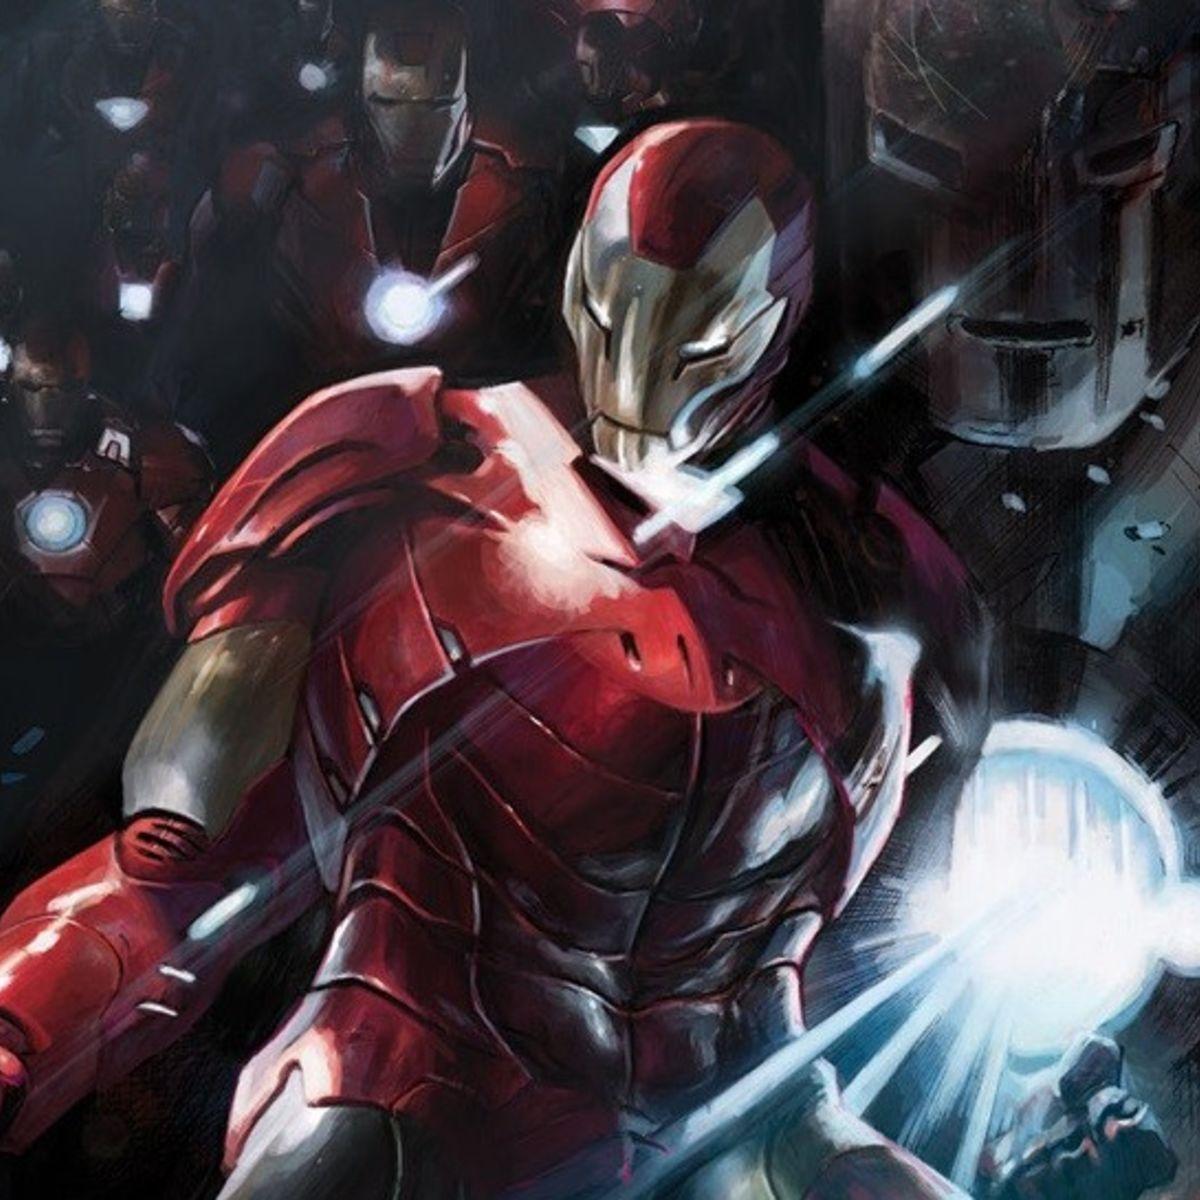 tony_stark_iron_man.jpg